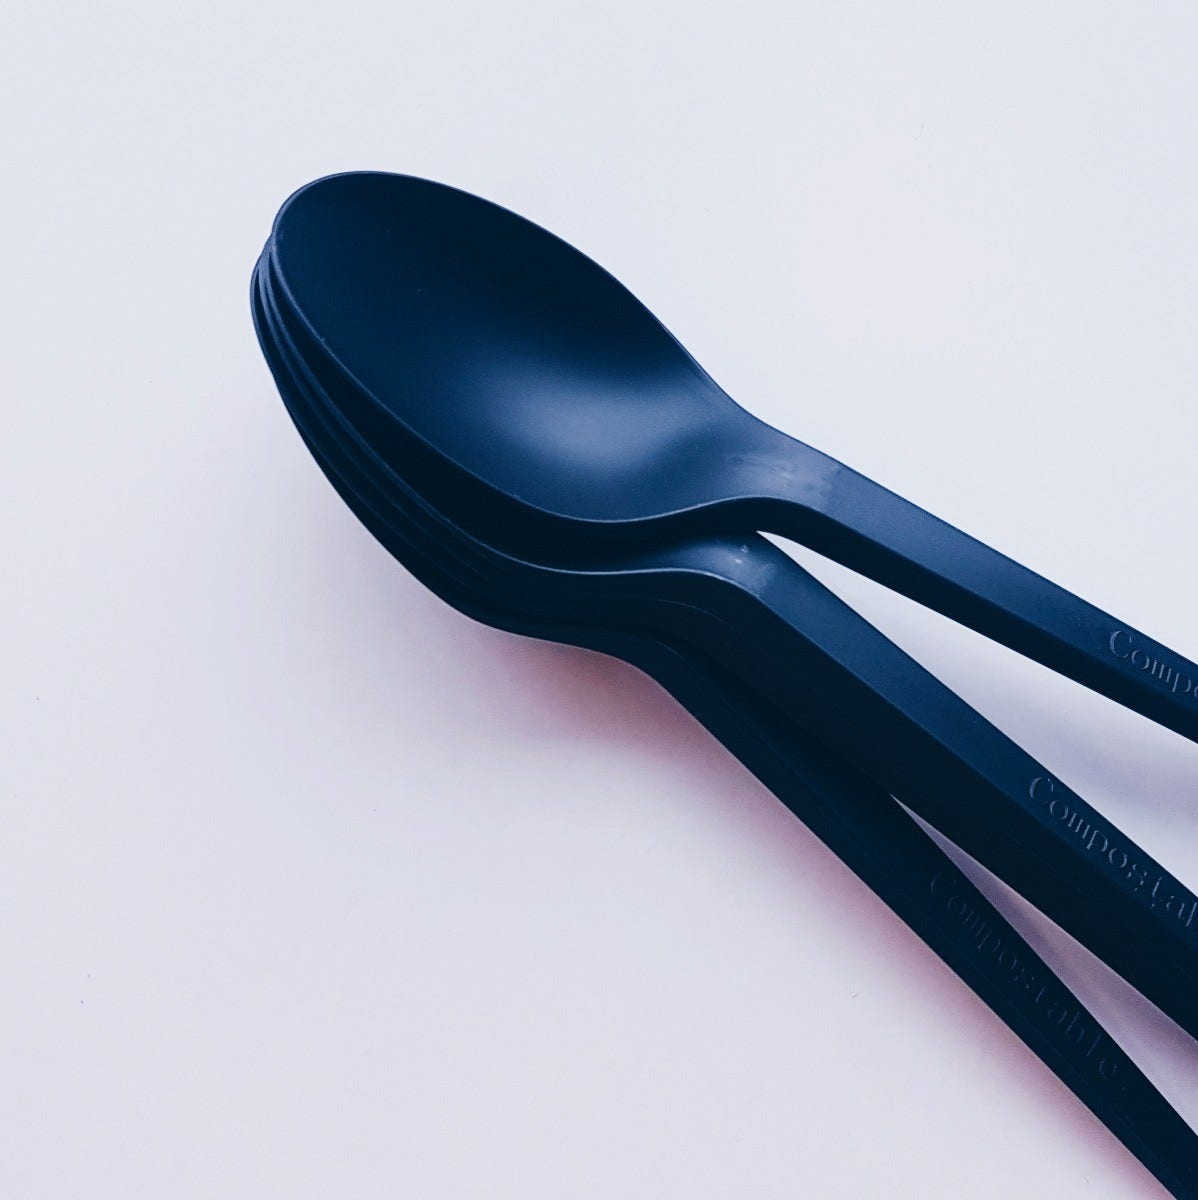 Black-Spoons-NL